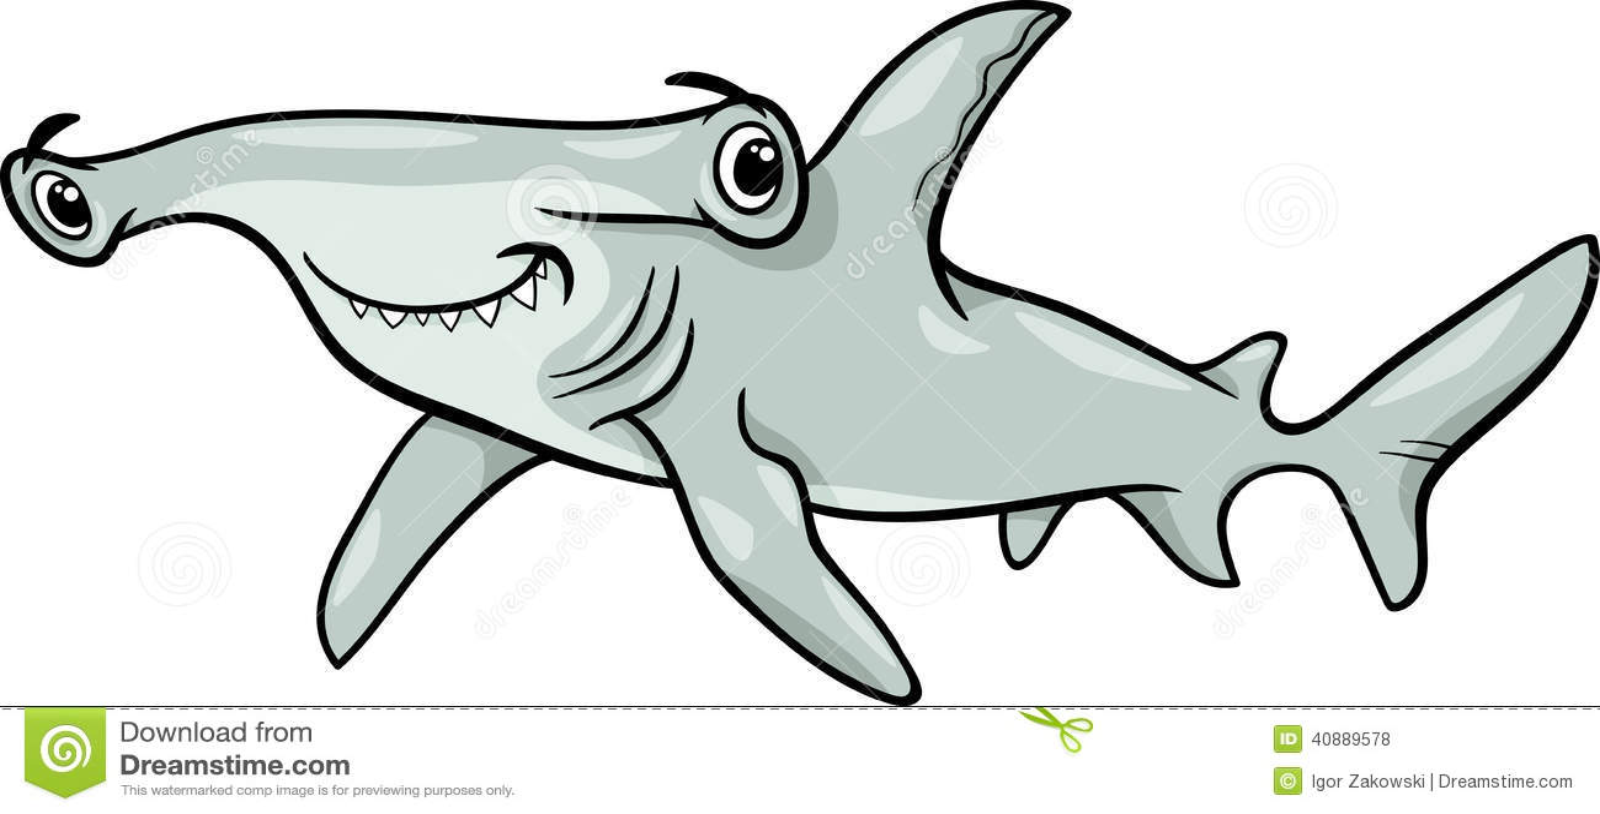 Hammerhead Shark Cartoon Illustration Stock Vector - Image: 40889578